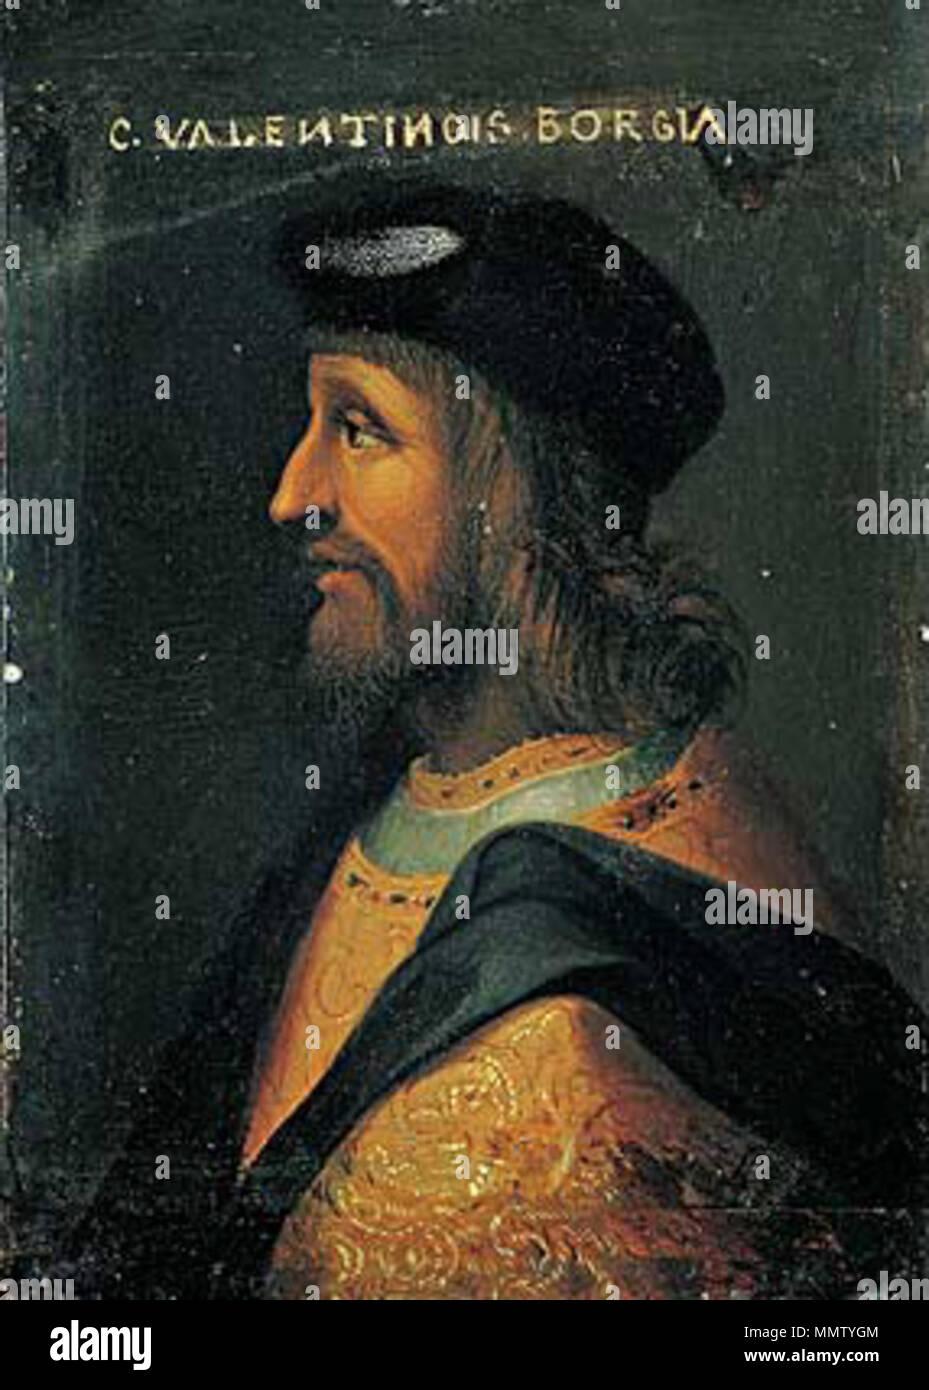 Cesare Borgia. 16-18 Jahrhundert. anonumous Cesare Borgia Palazzo Ruspoli  Stockfotografie - Alamy